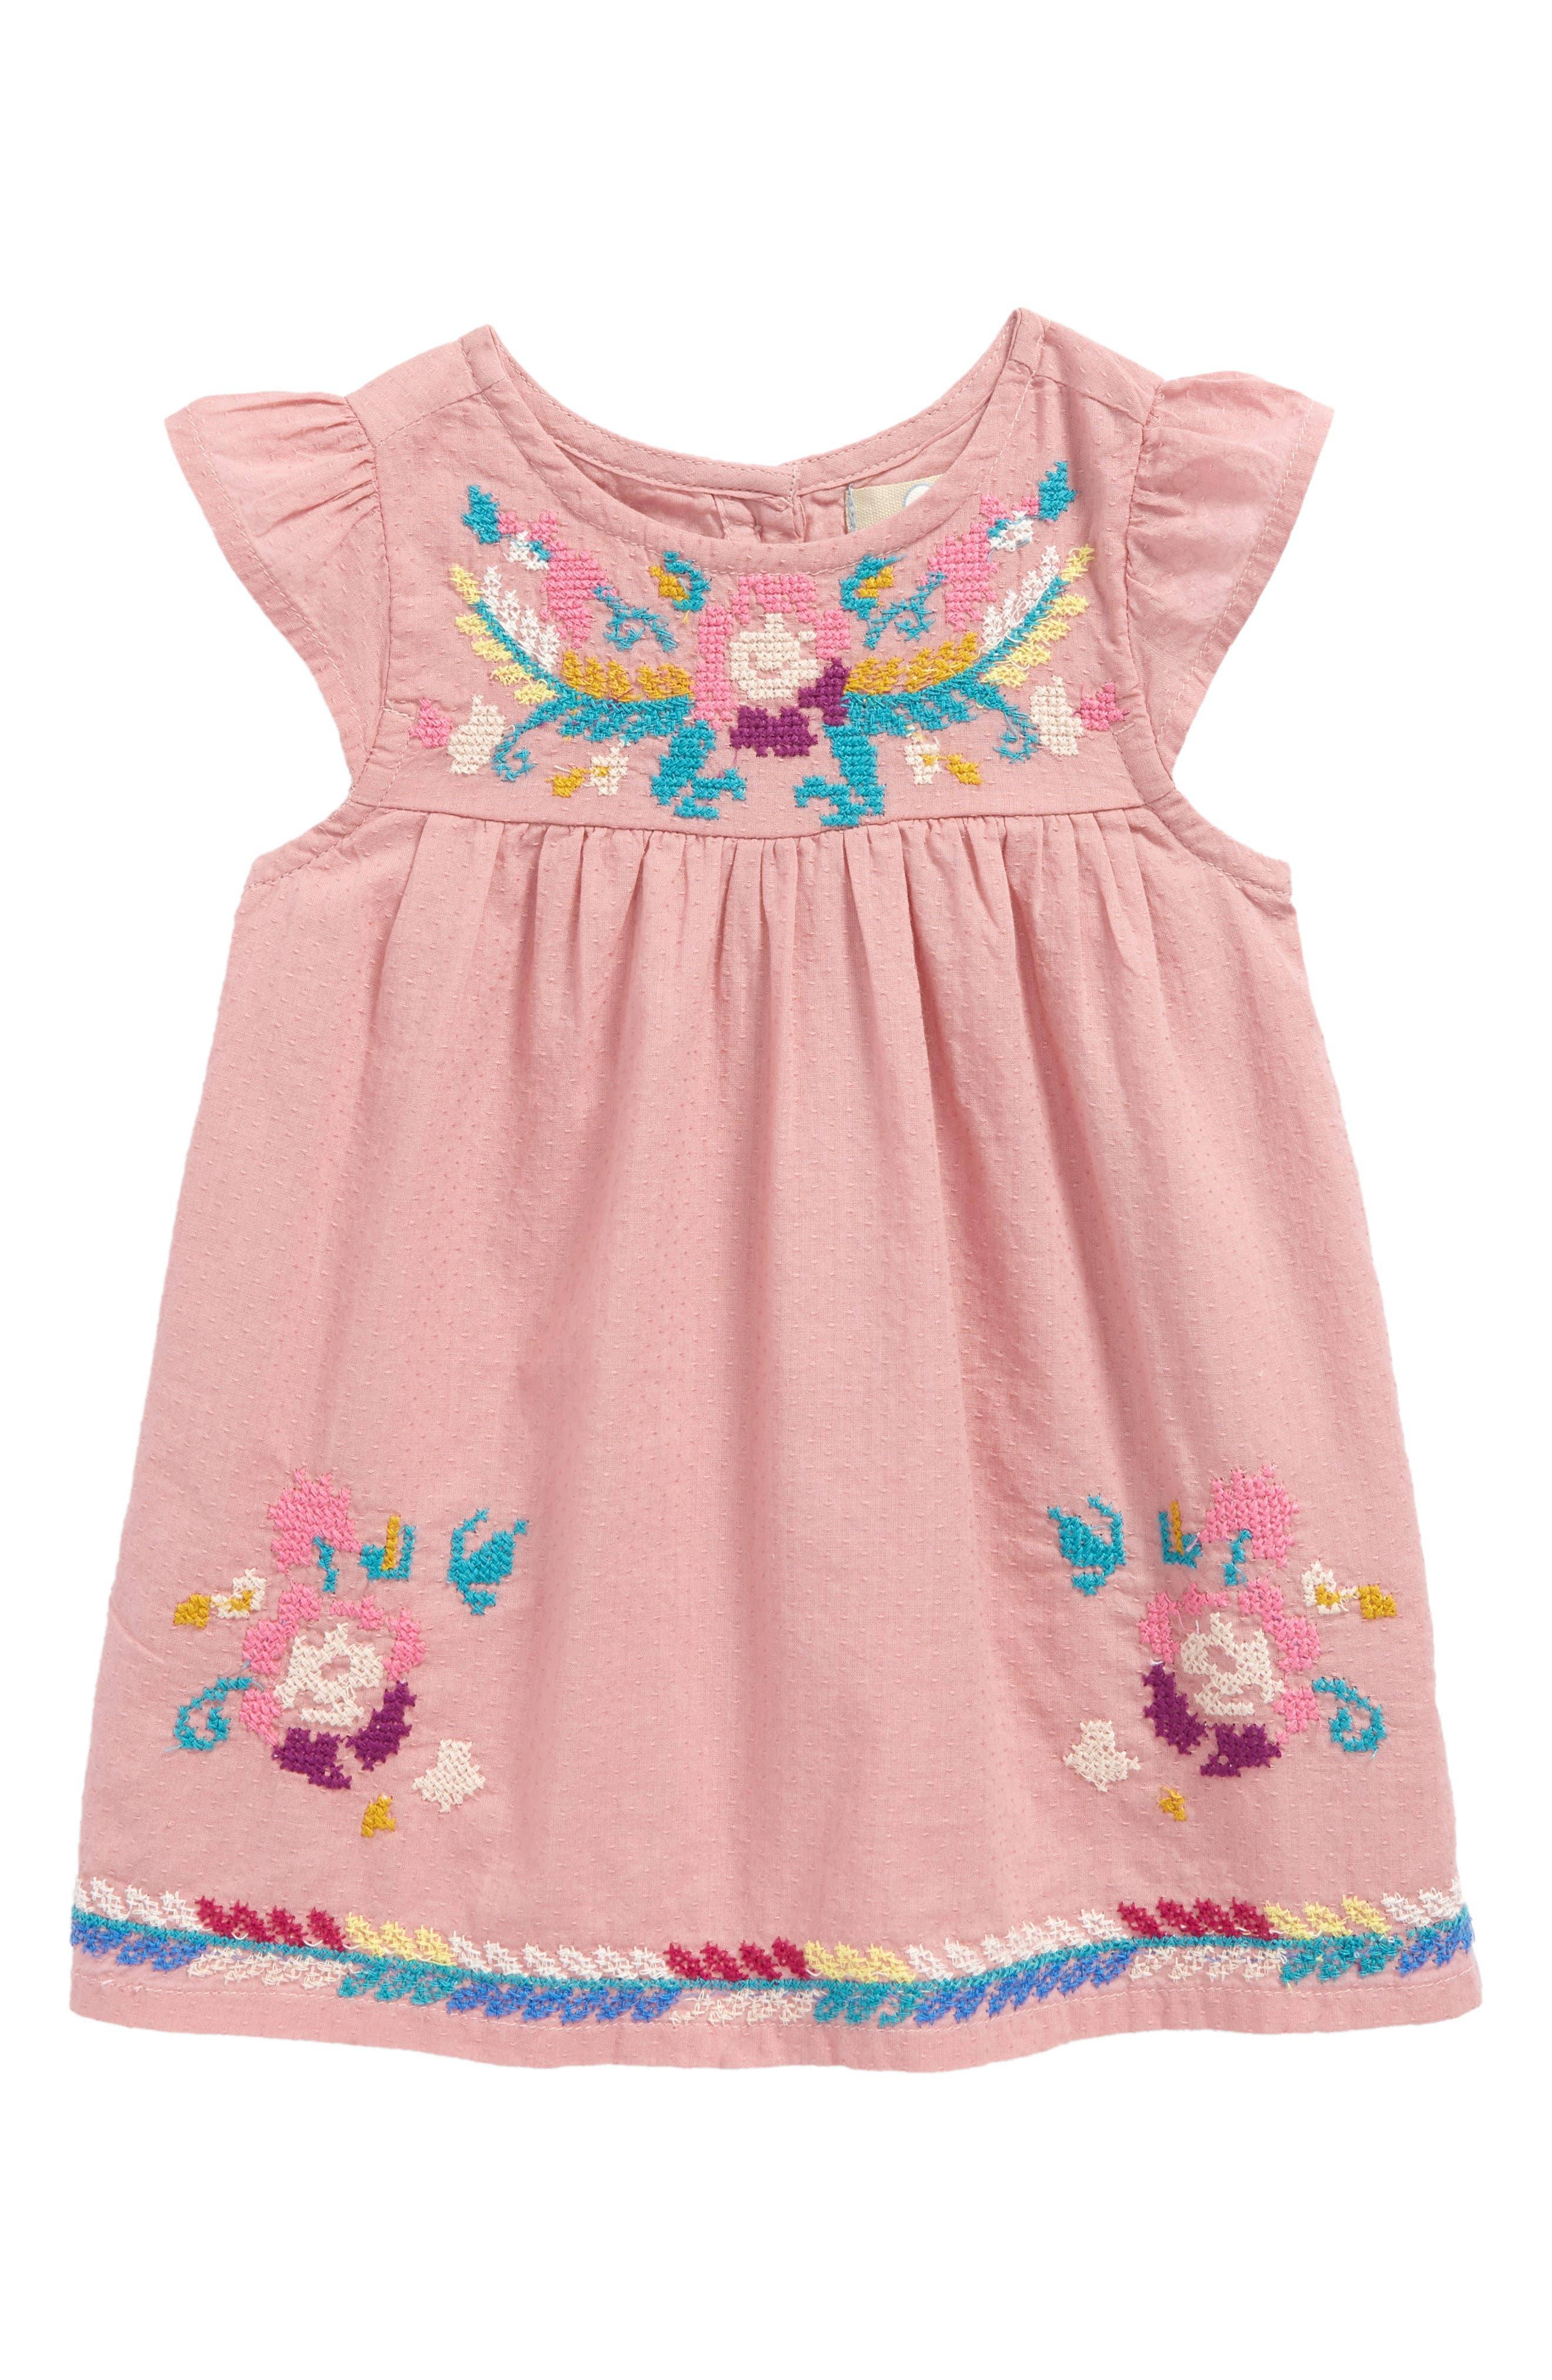 Main Image - Peek Delilah Embroidered Dress (Baby Girls)